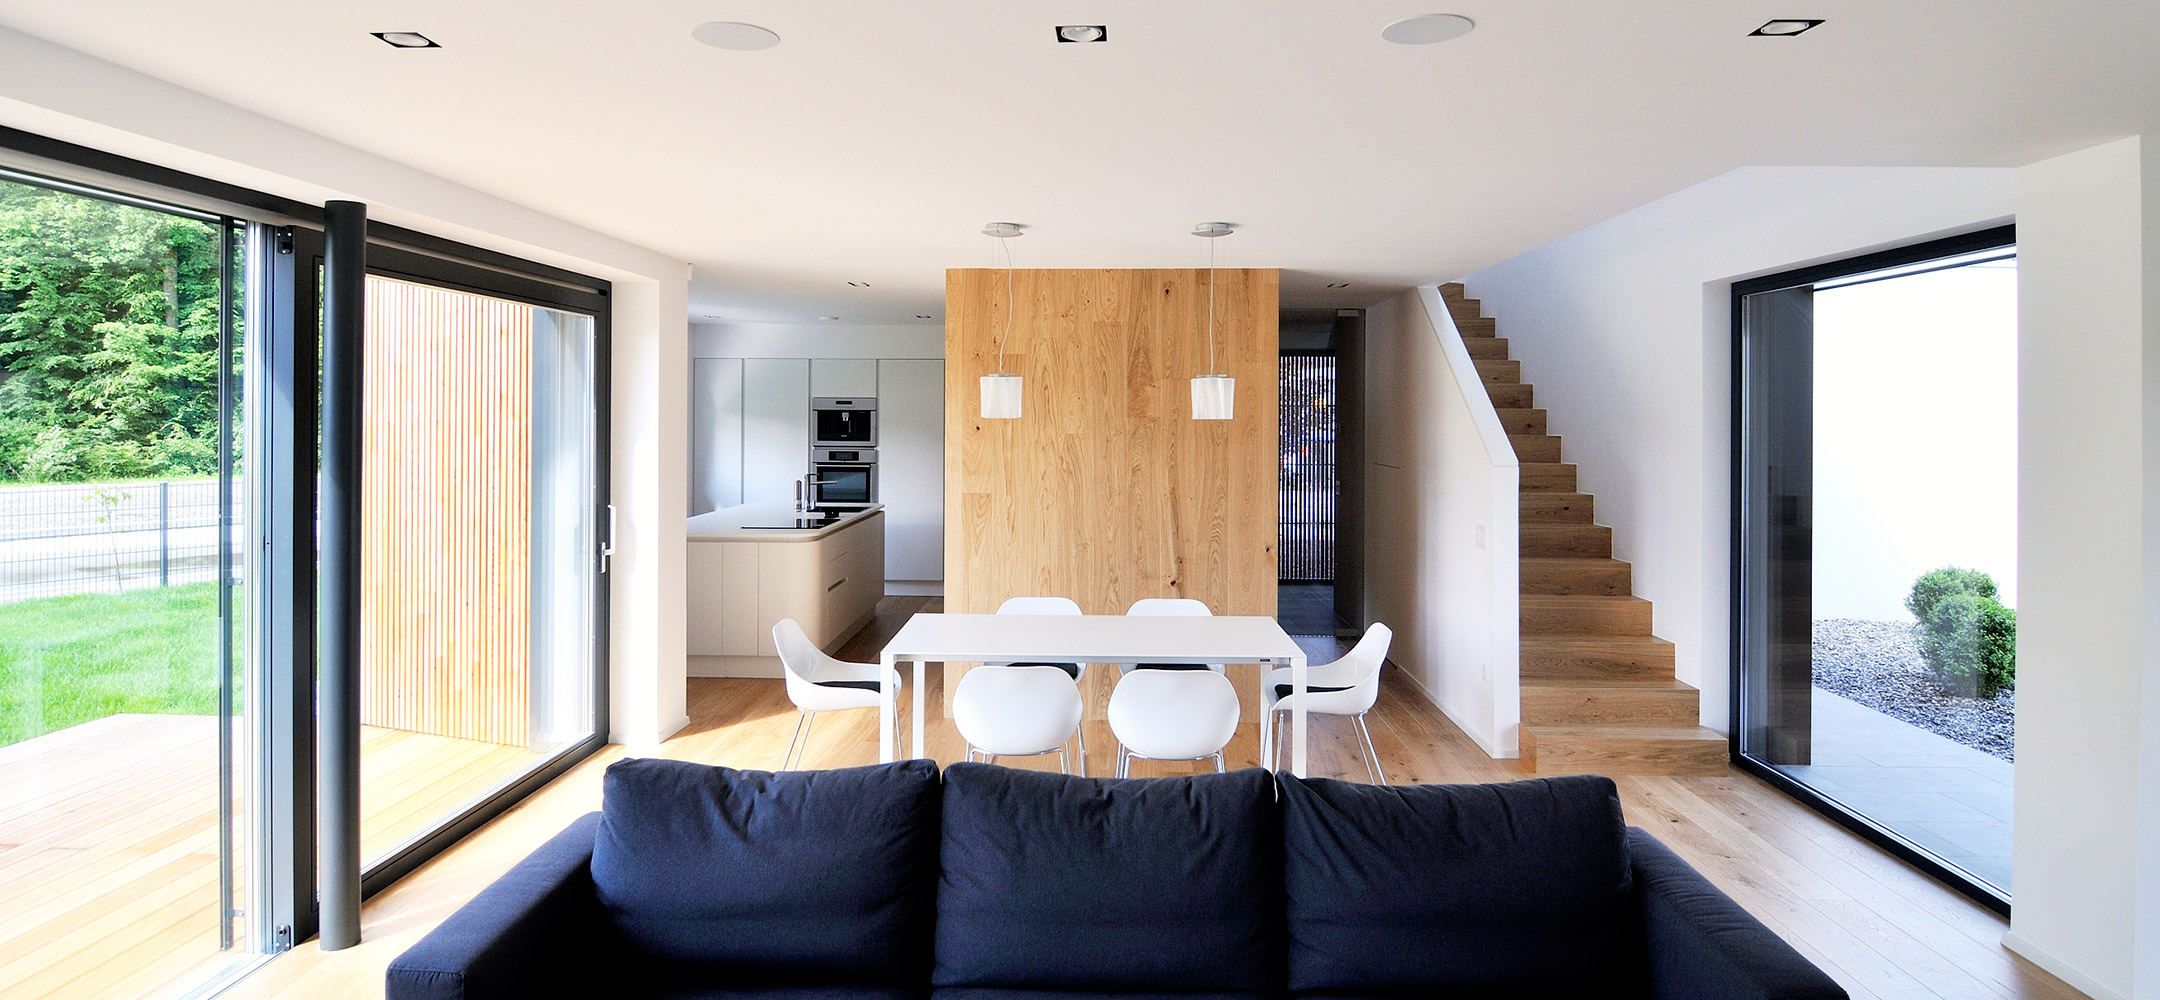 Dnevni prostor aktivne hiše Lumar